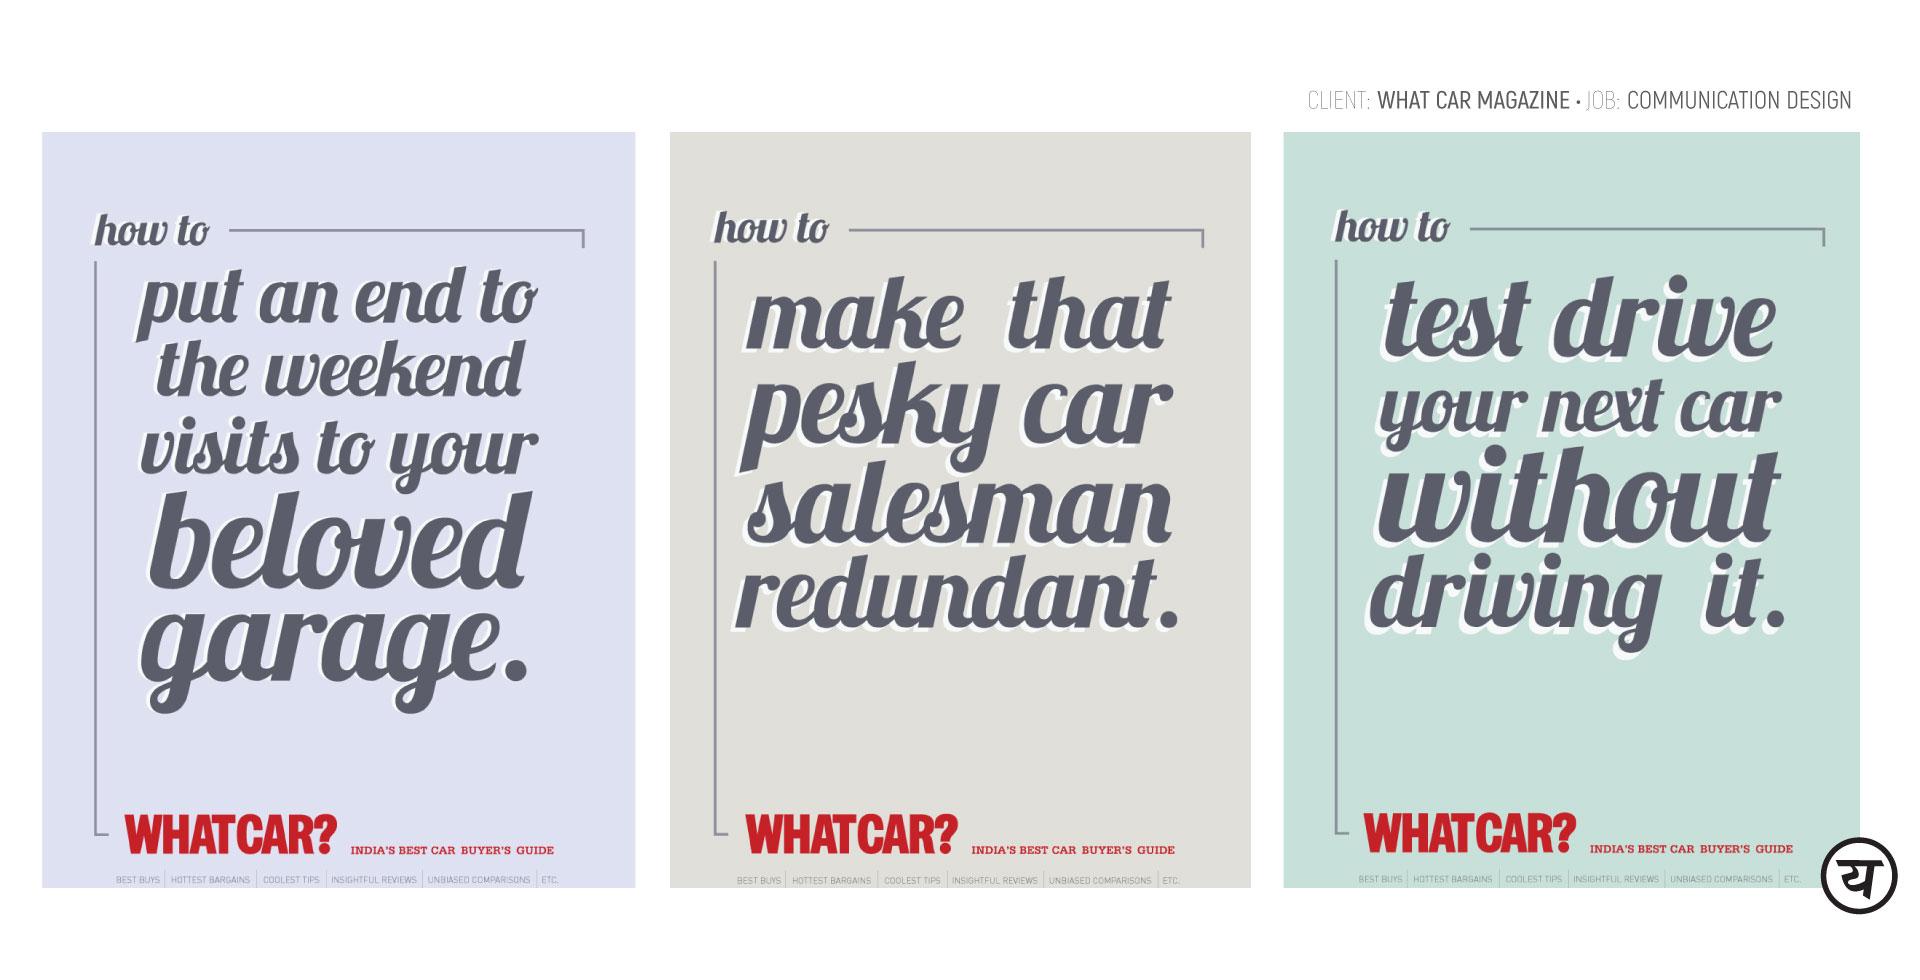 YesYesWhyNot_Communication-Design_Haymarket-#7_04.08.19